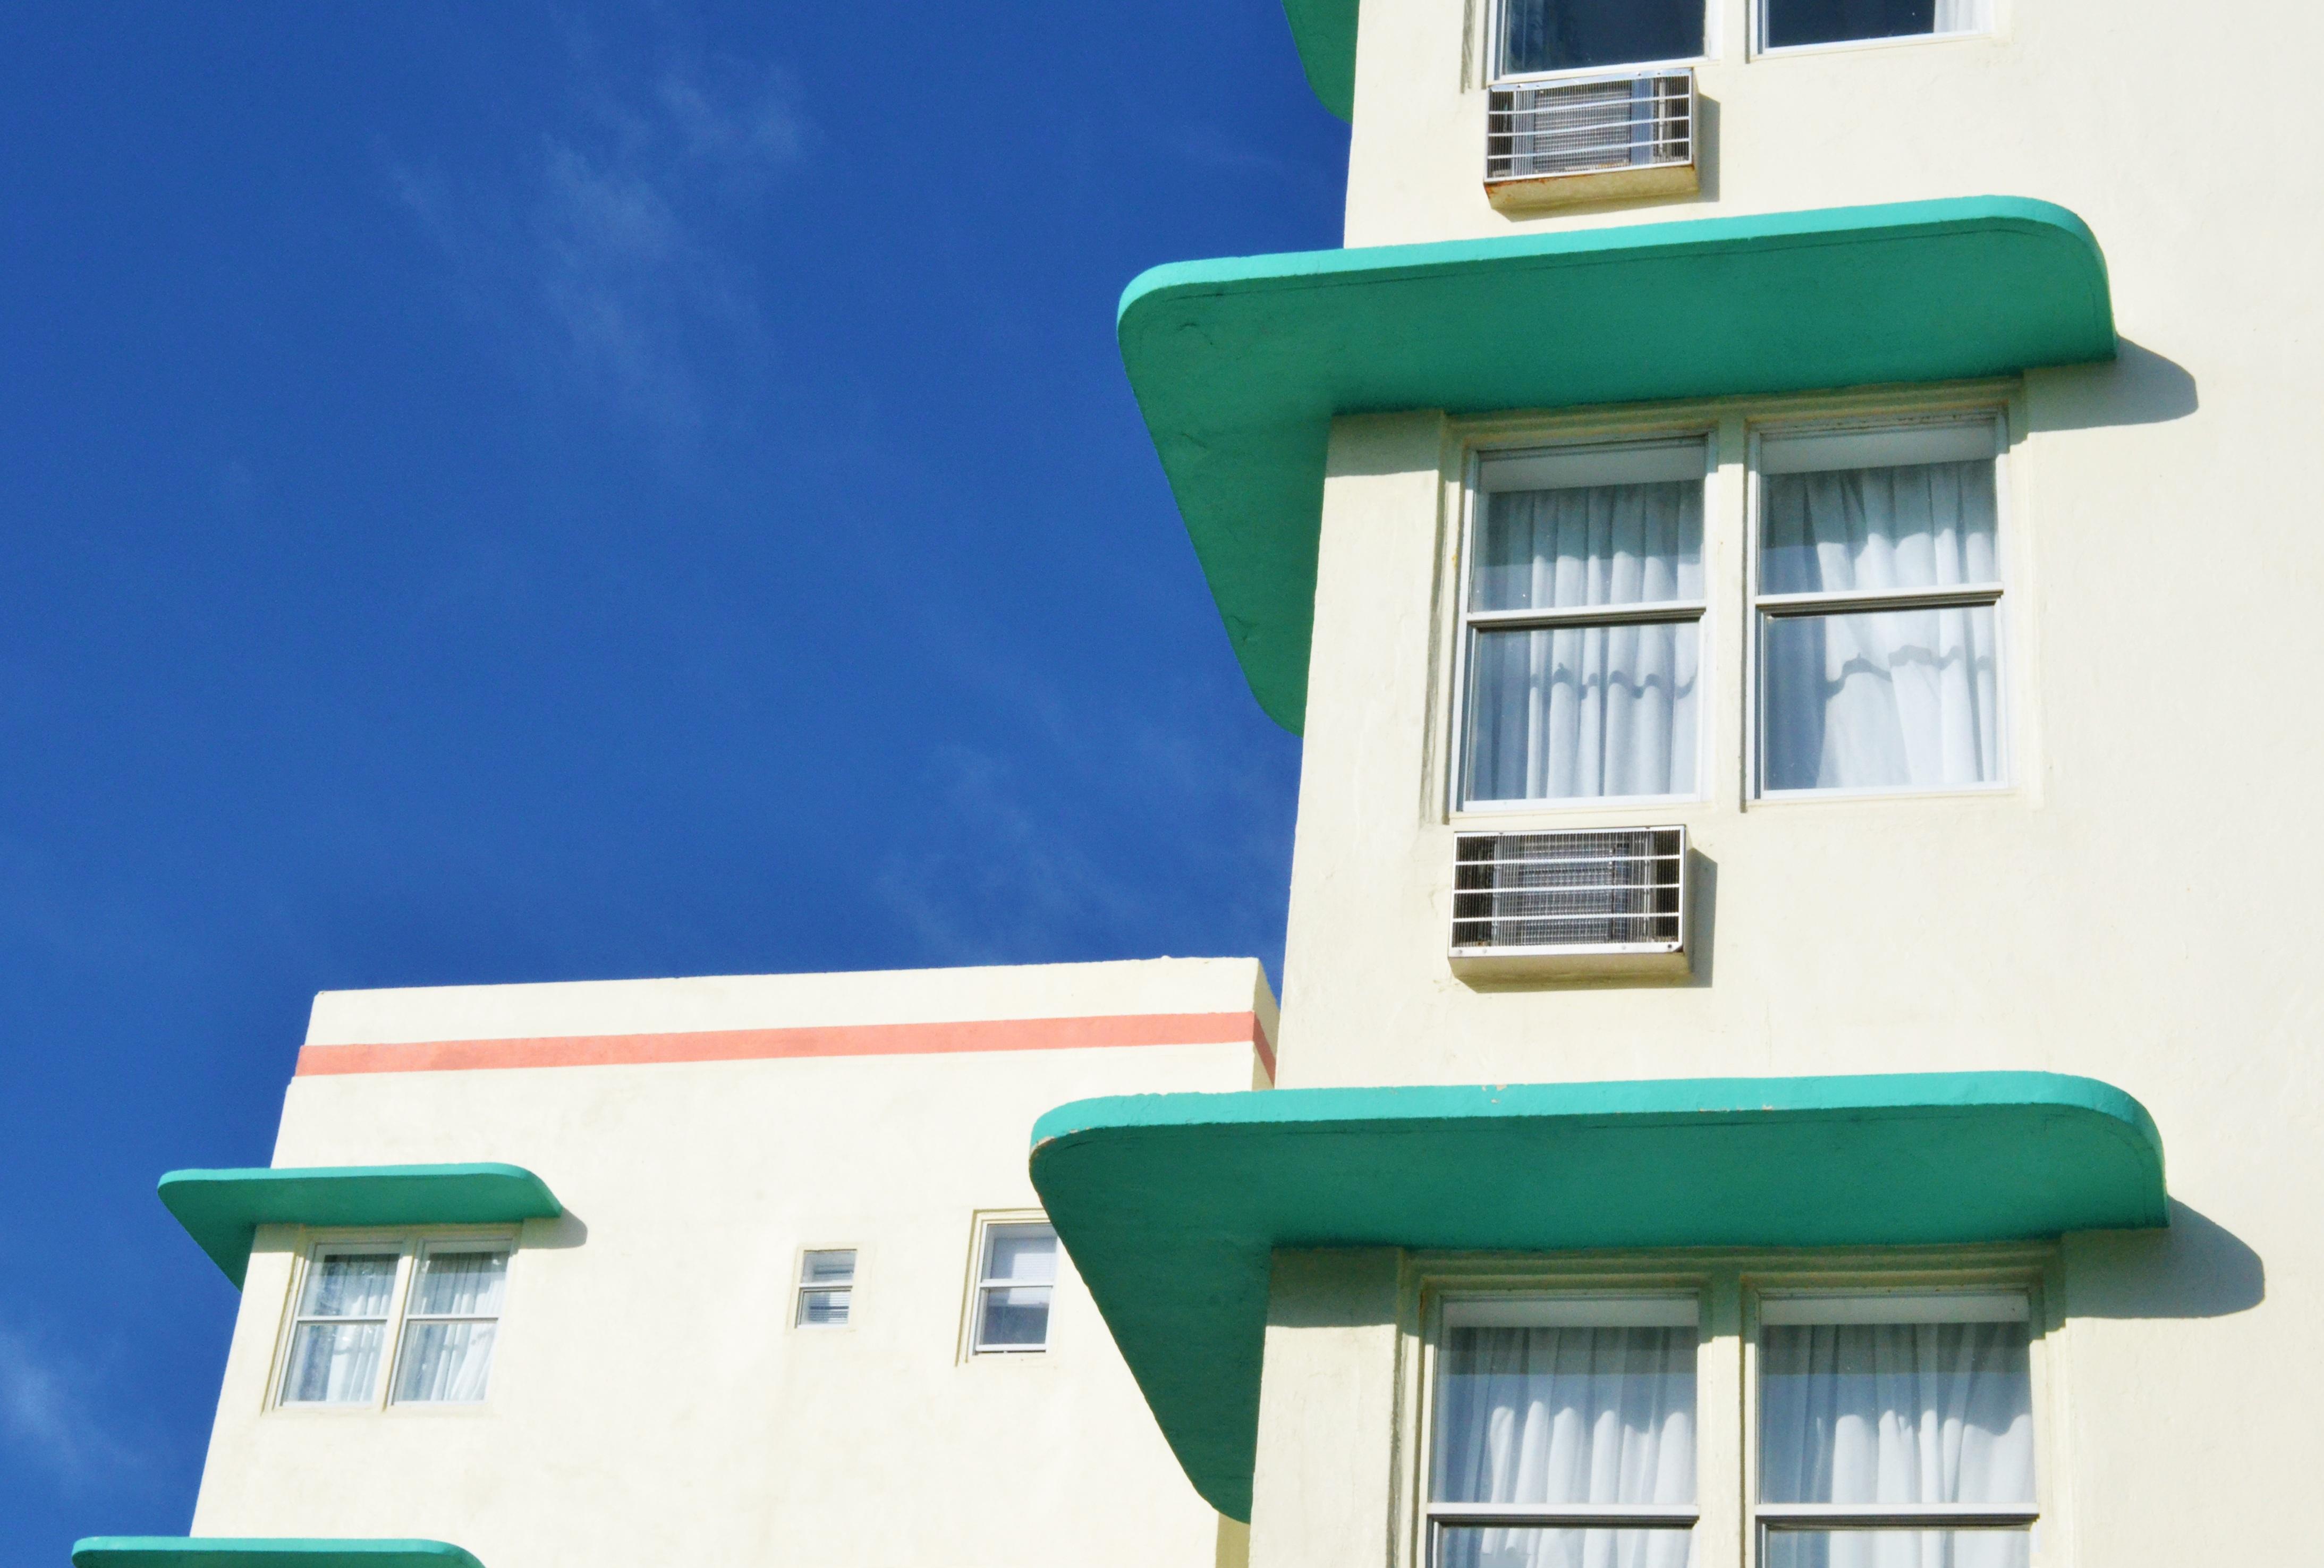 Free Images : architecture, sun, house, building, city ...